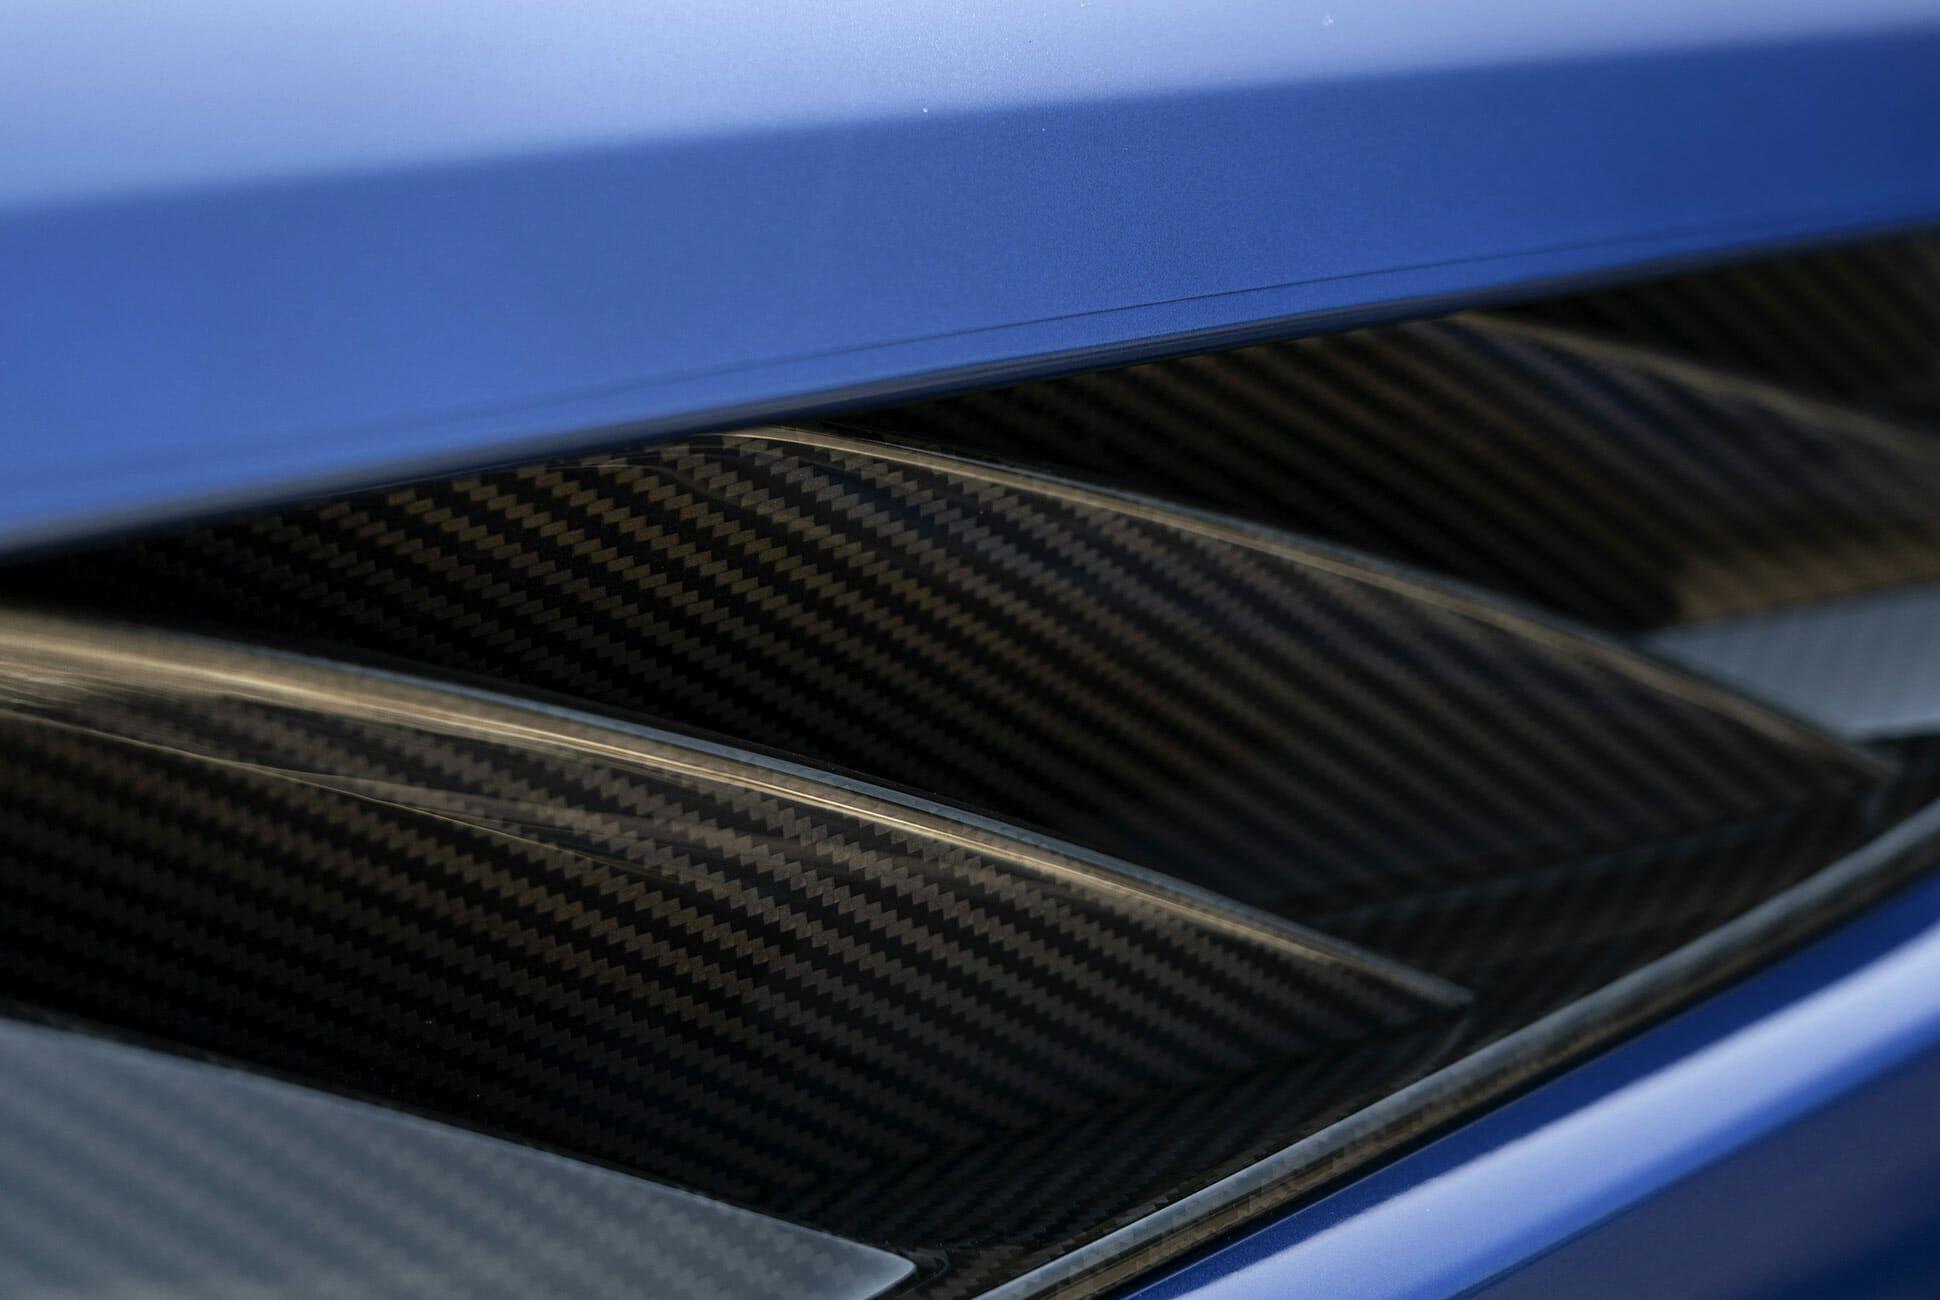 Aston-Martin-DBS-Superleggera-Volante-Review-gear-patrol-slide-8